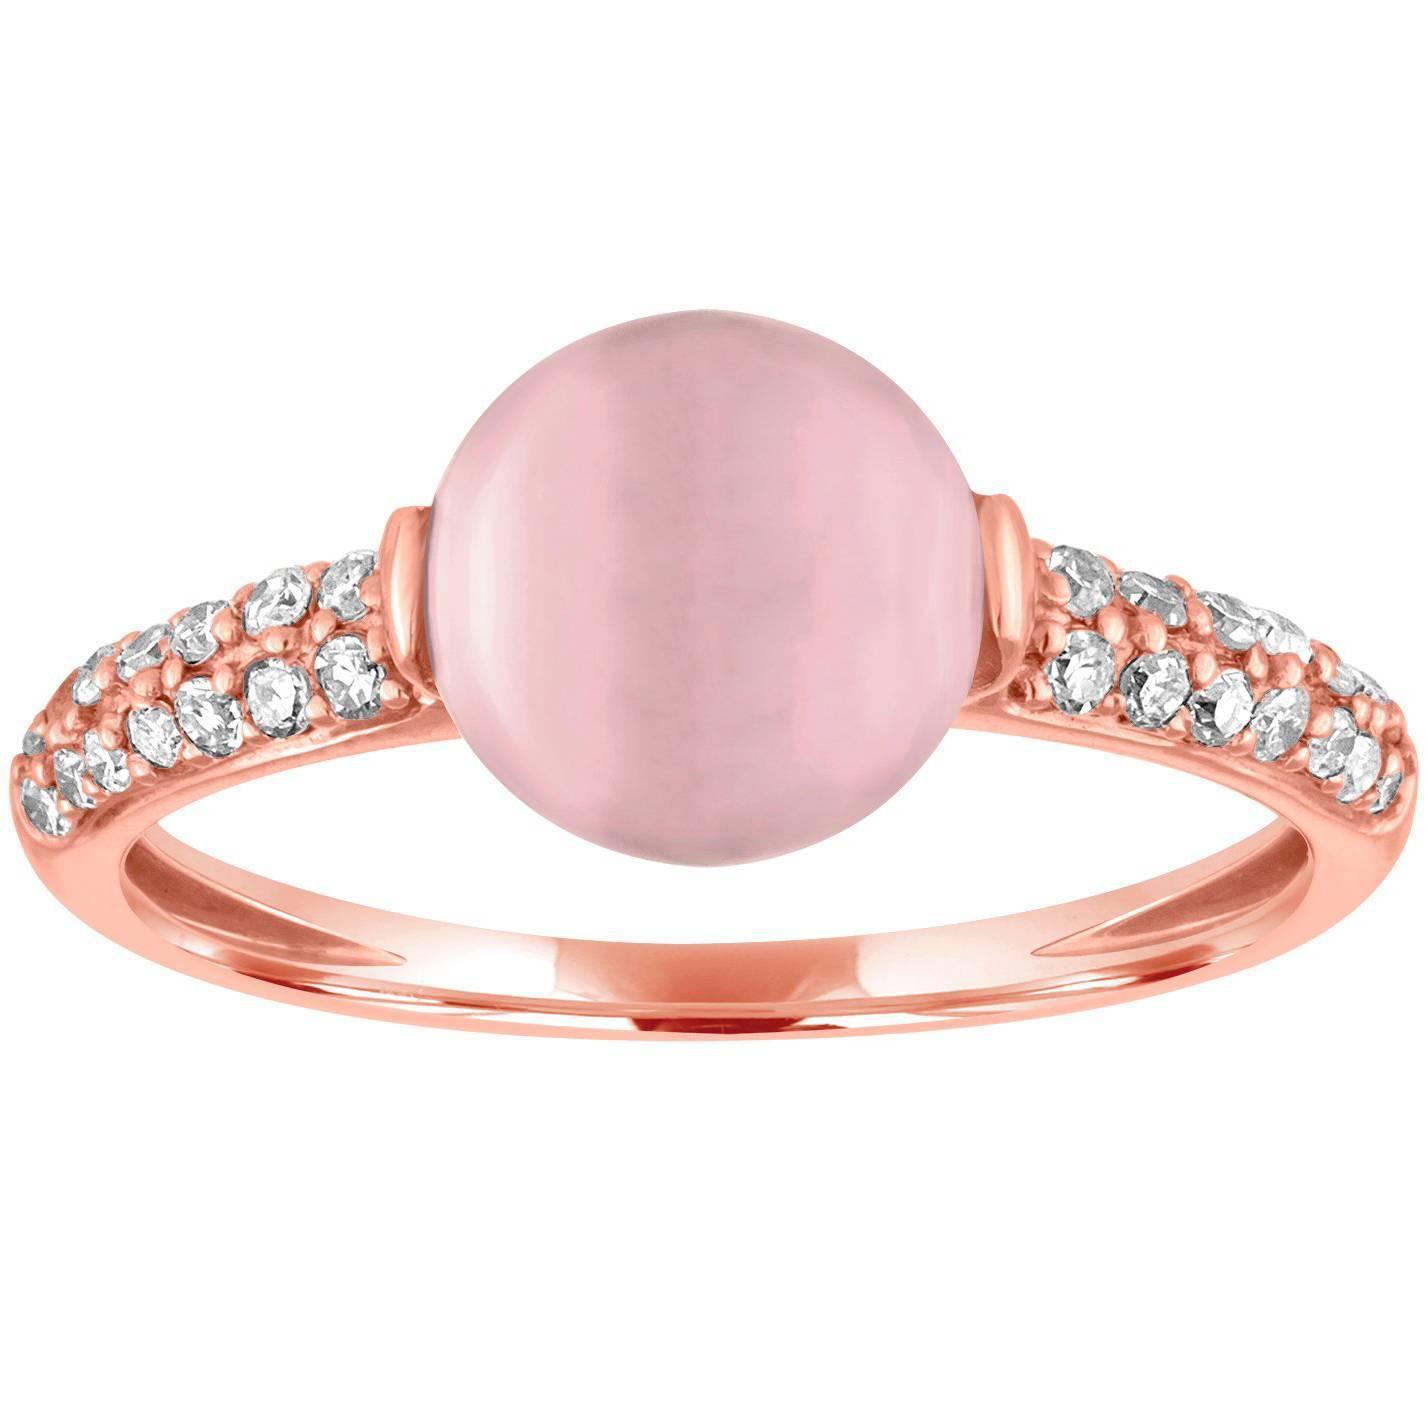 Ram Chandra Aquamarine 22K Hammered Gold Ring For Sale at 1stdibs